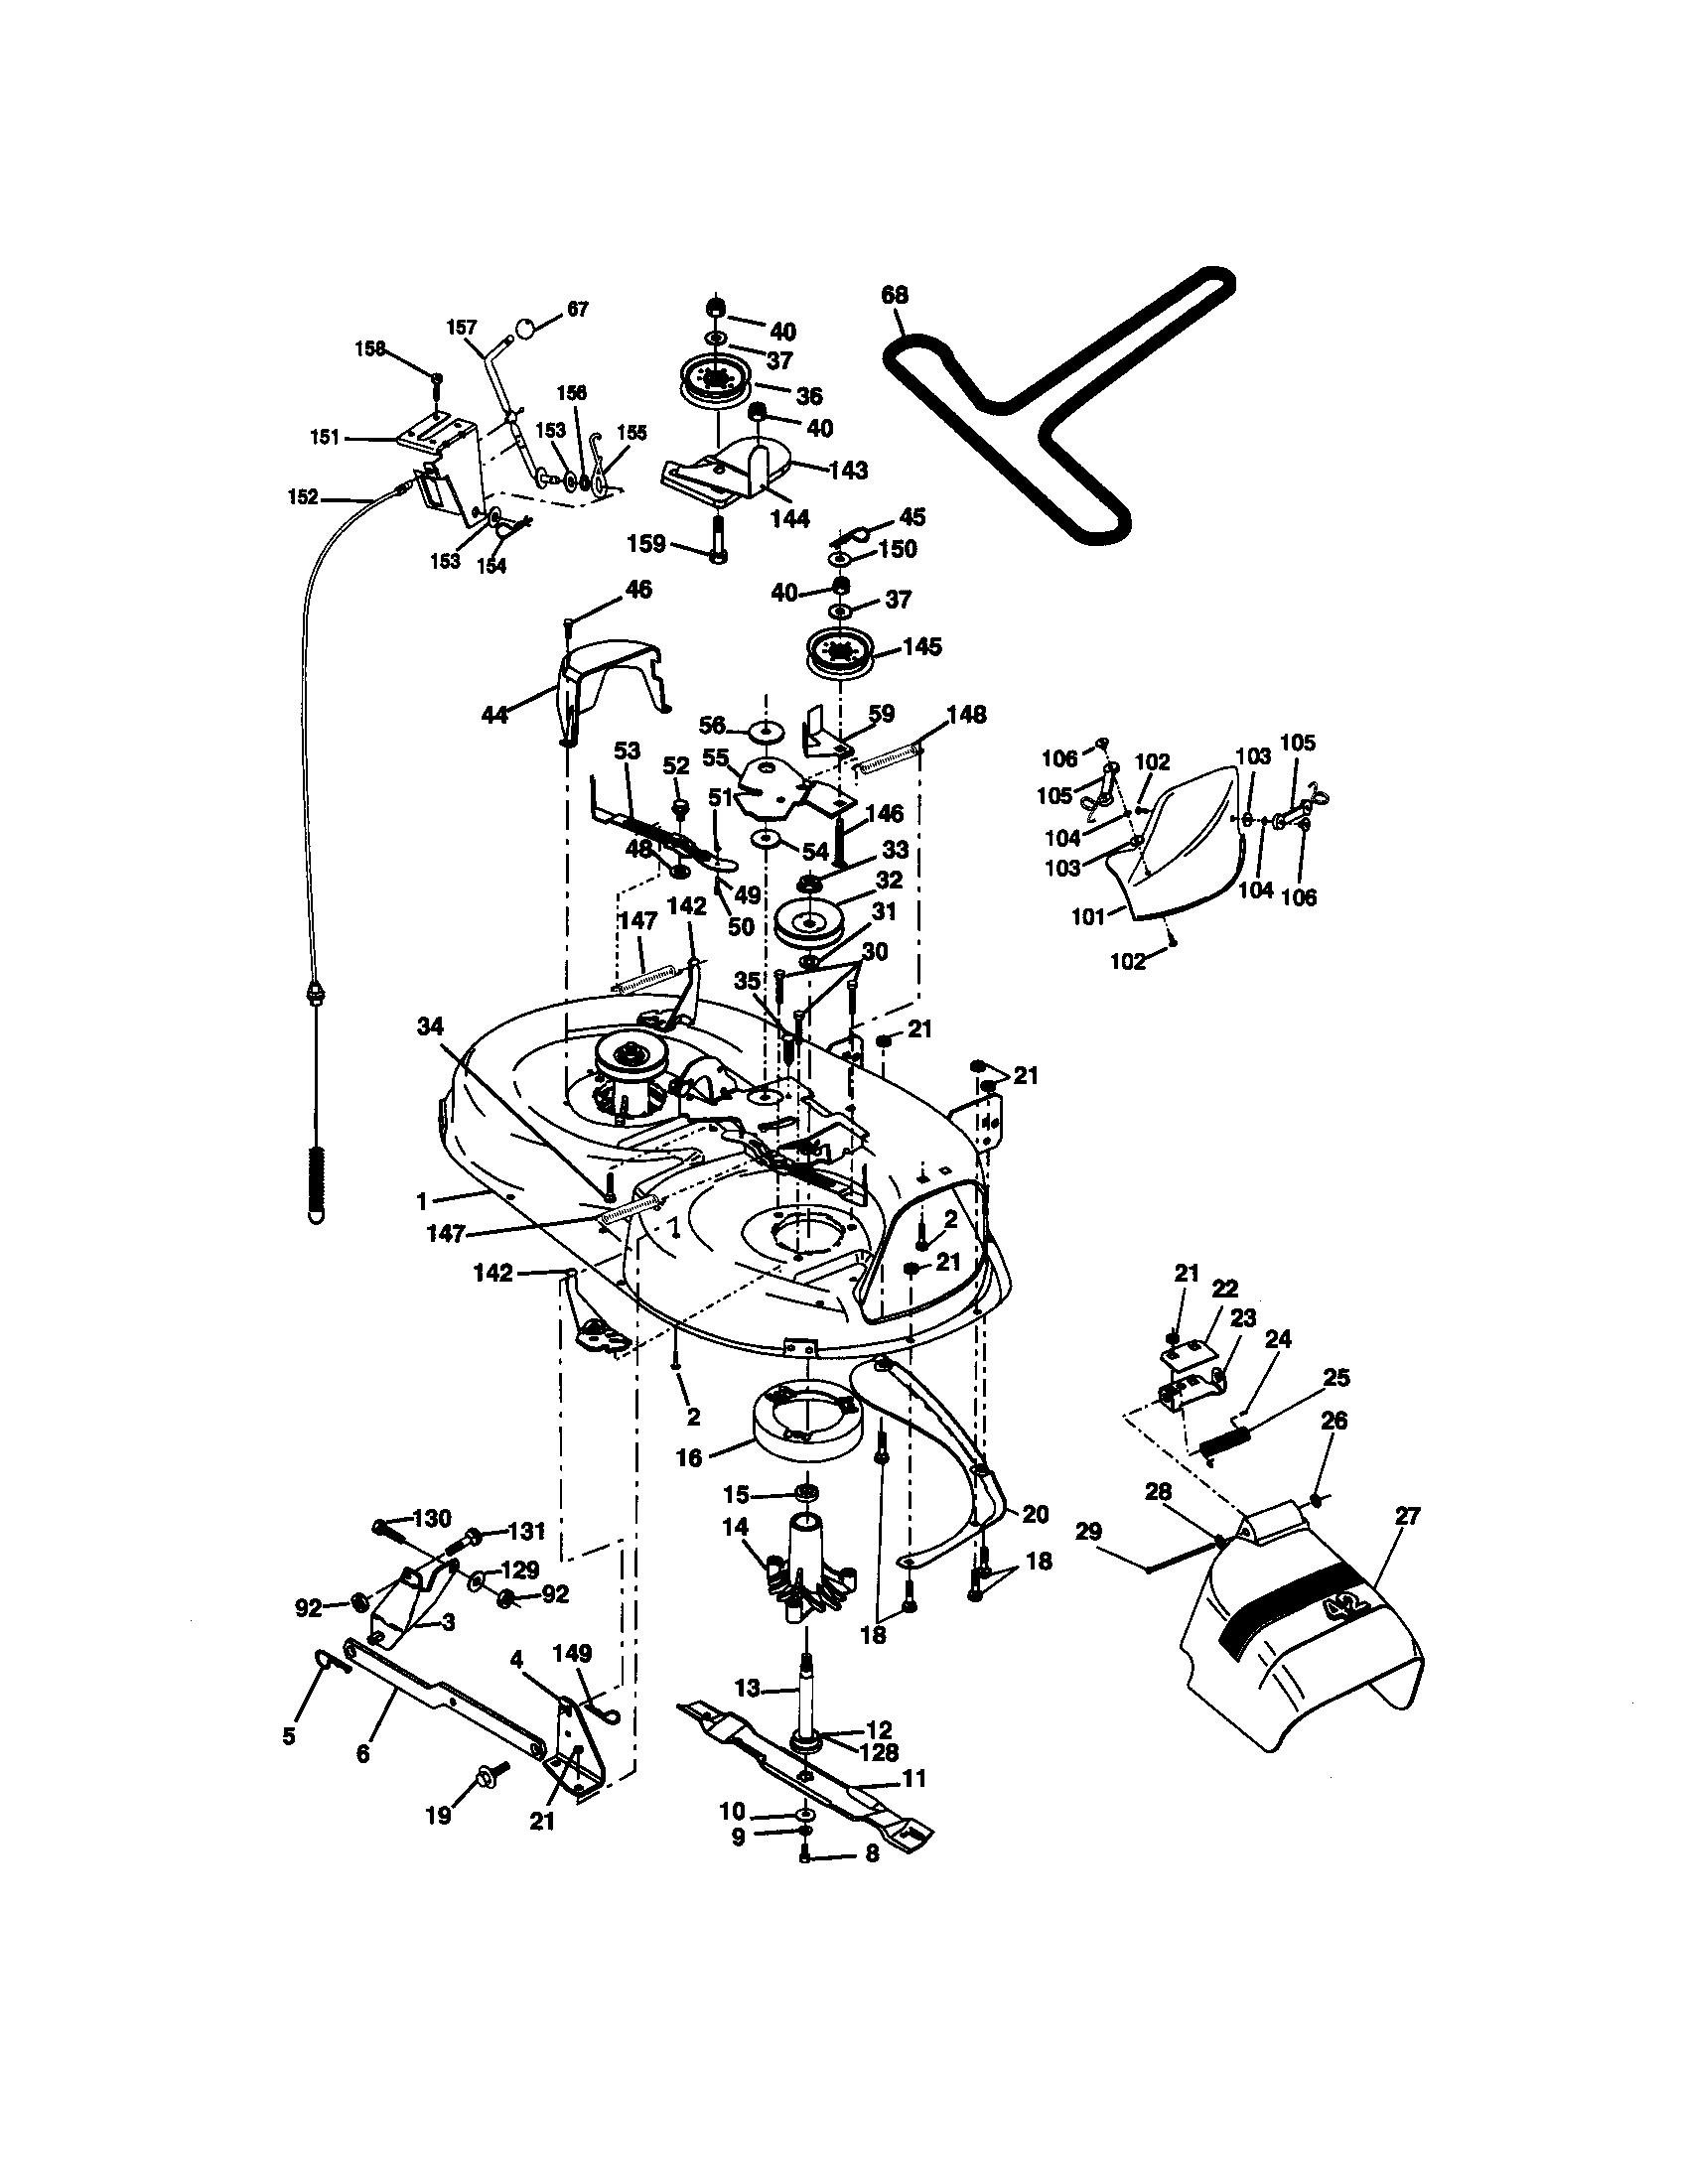 wiring diagram for lt1000 [ 1696 x 2200 Pixel ]